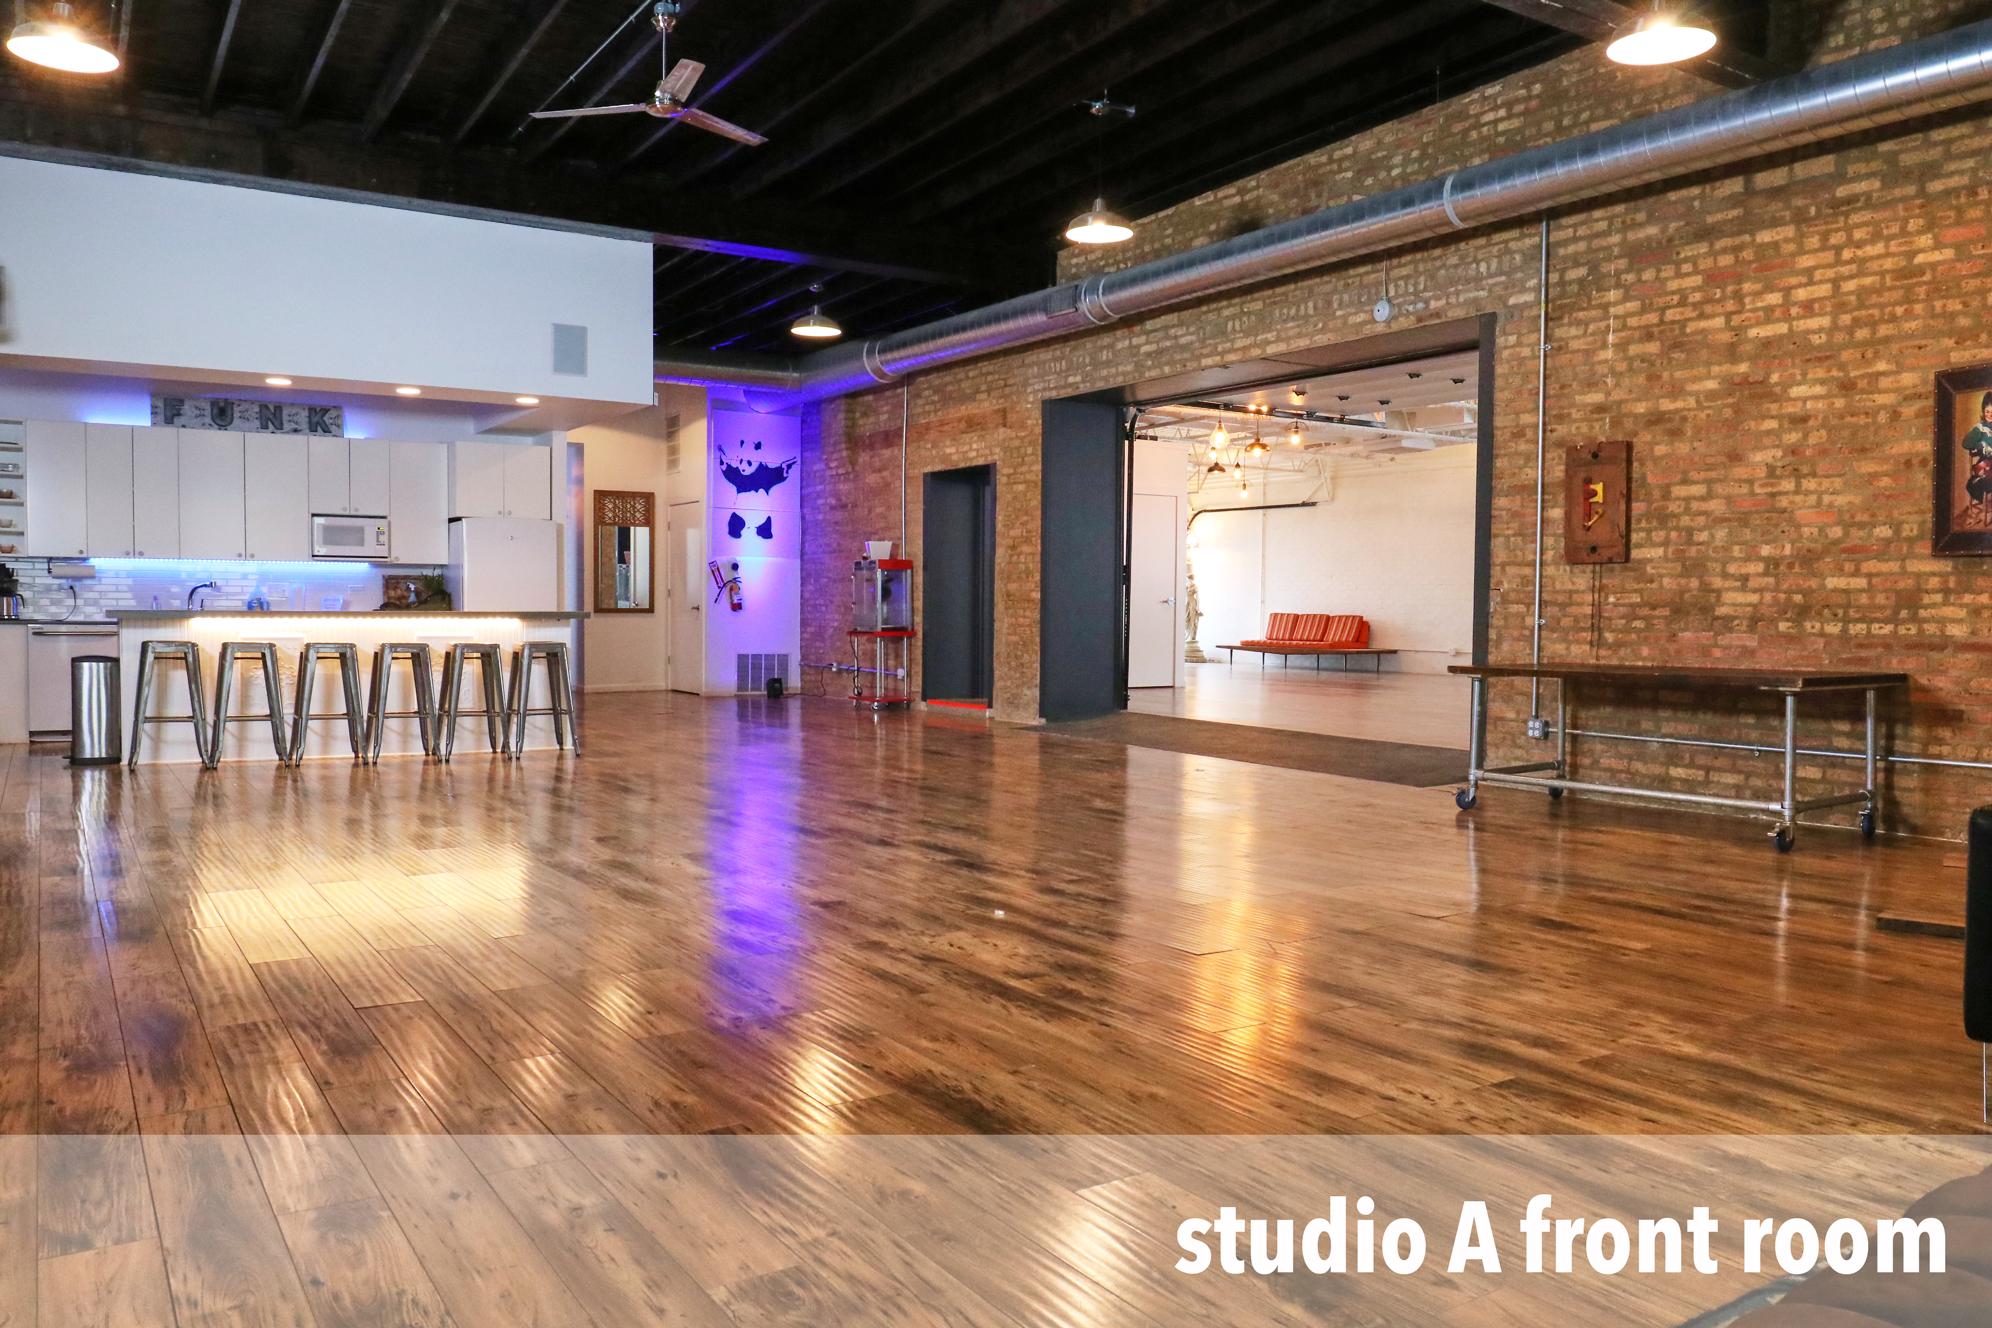 studio-A-front-room-4.png